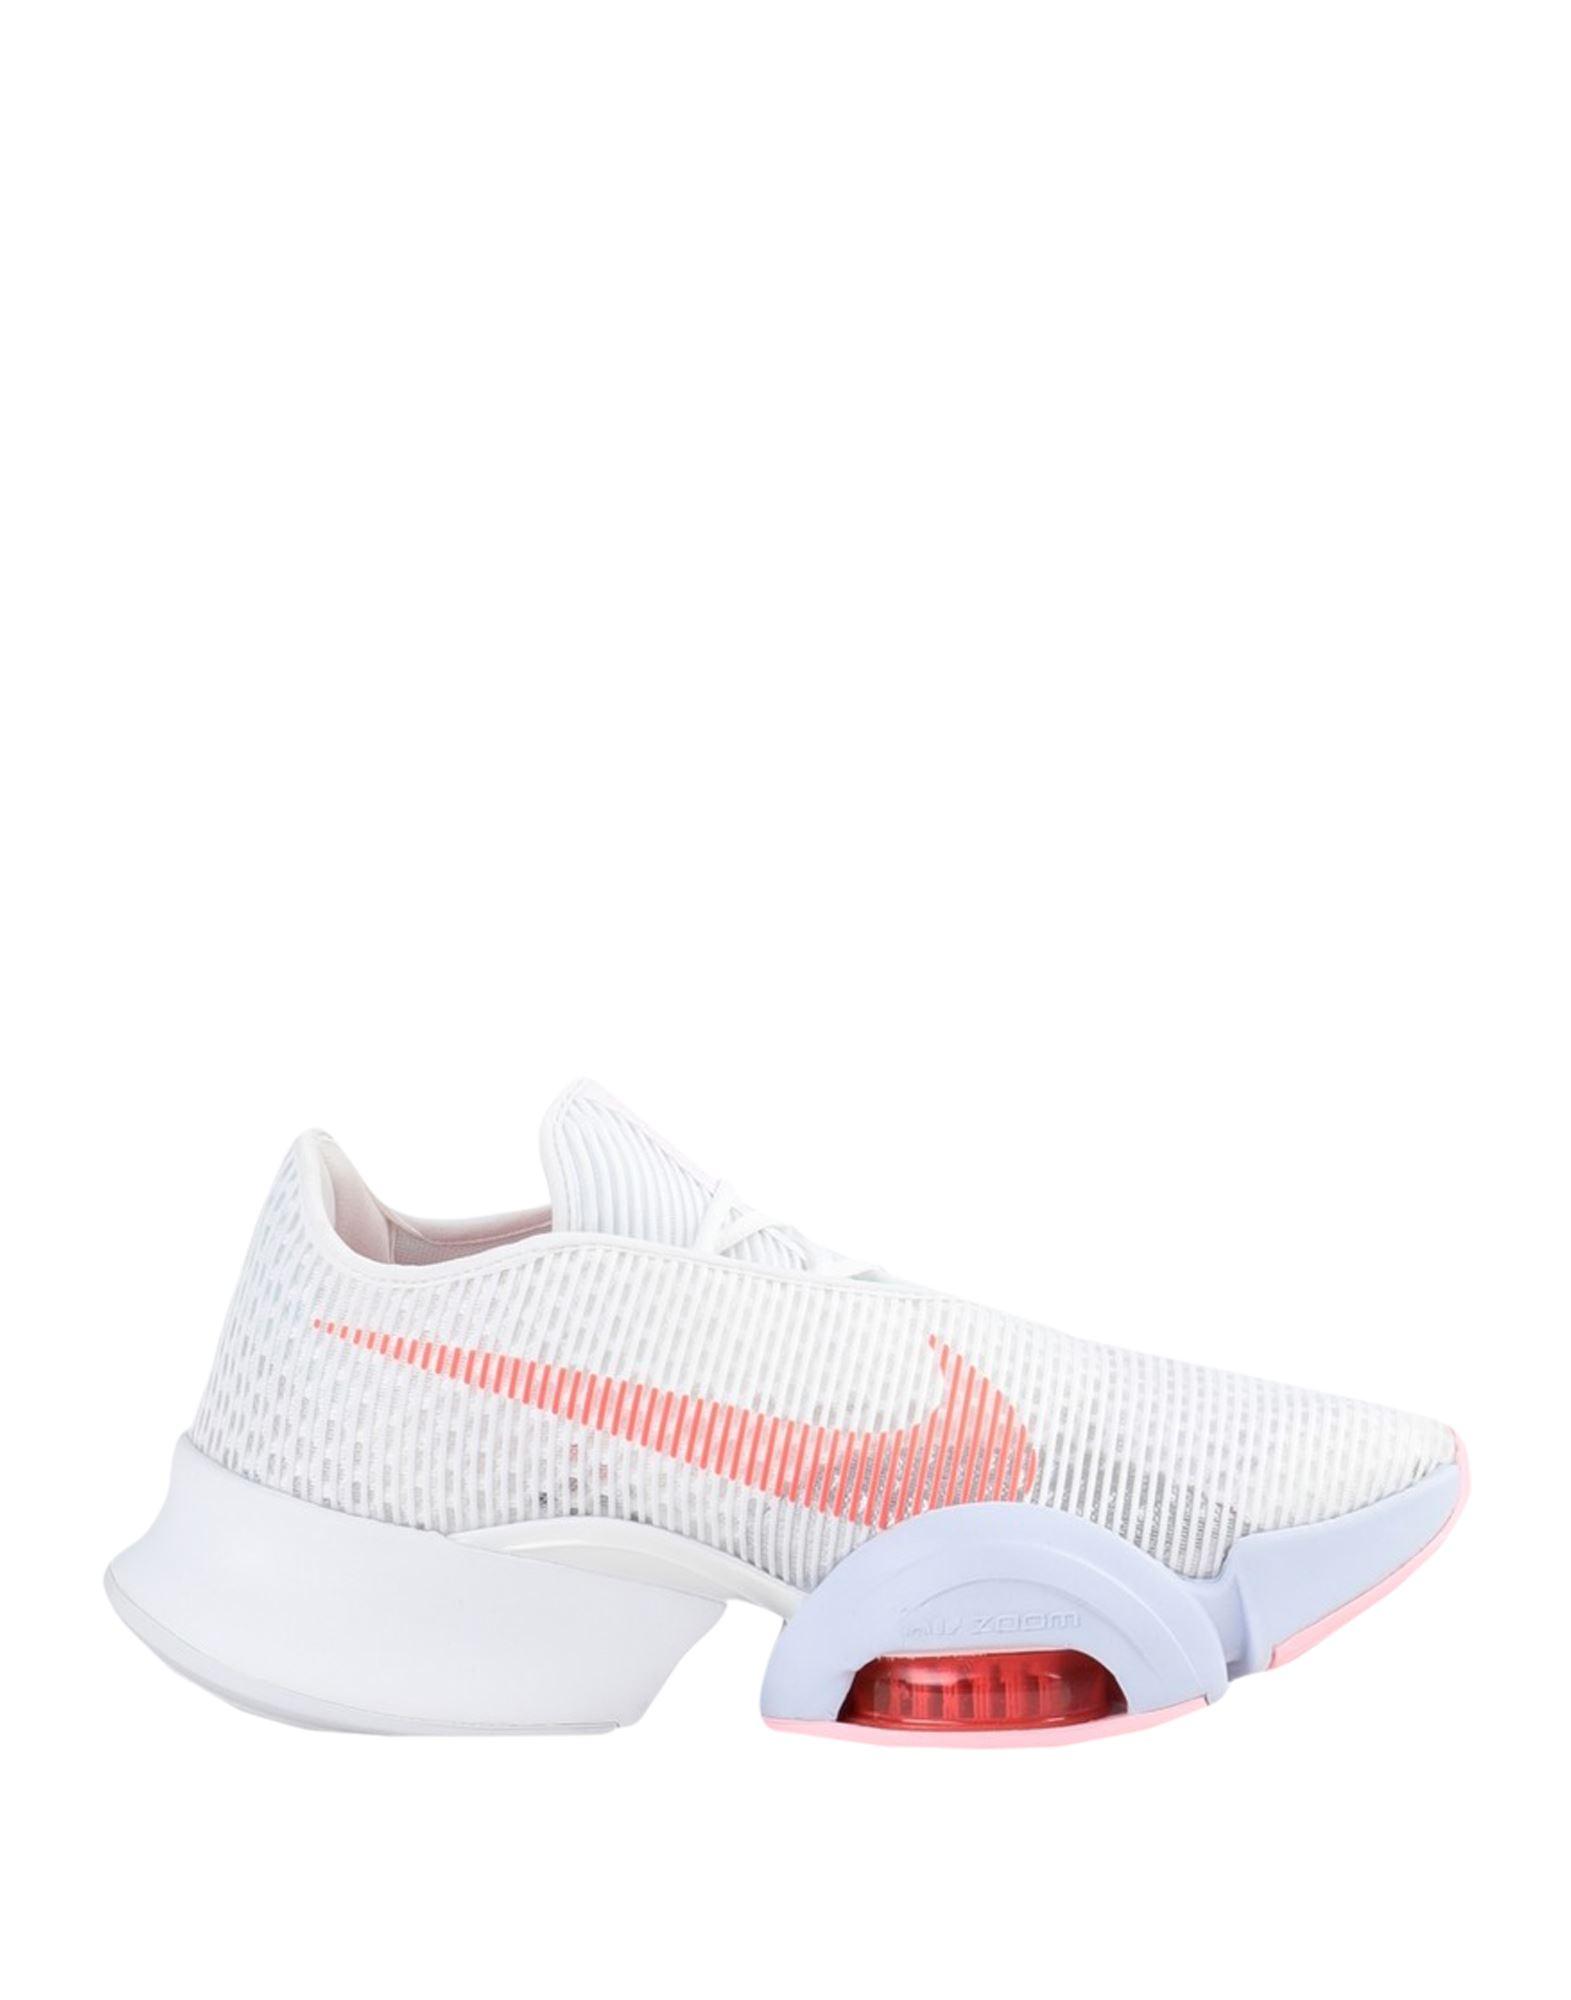 NIKE Кеды и кроссовки кроссовки женские nike air zoom prestige hc размер 35 5